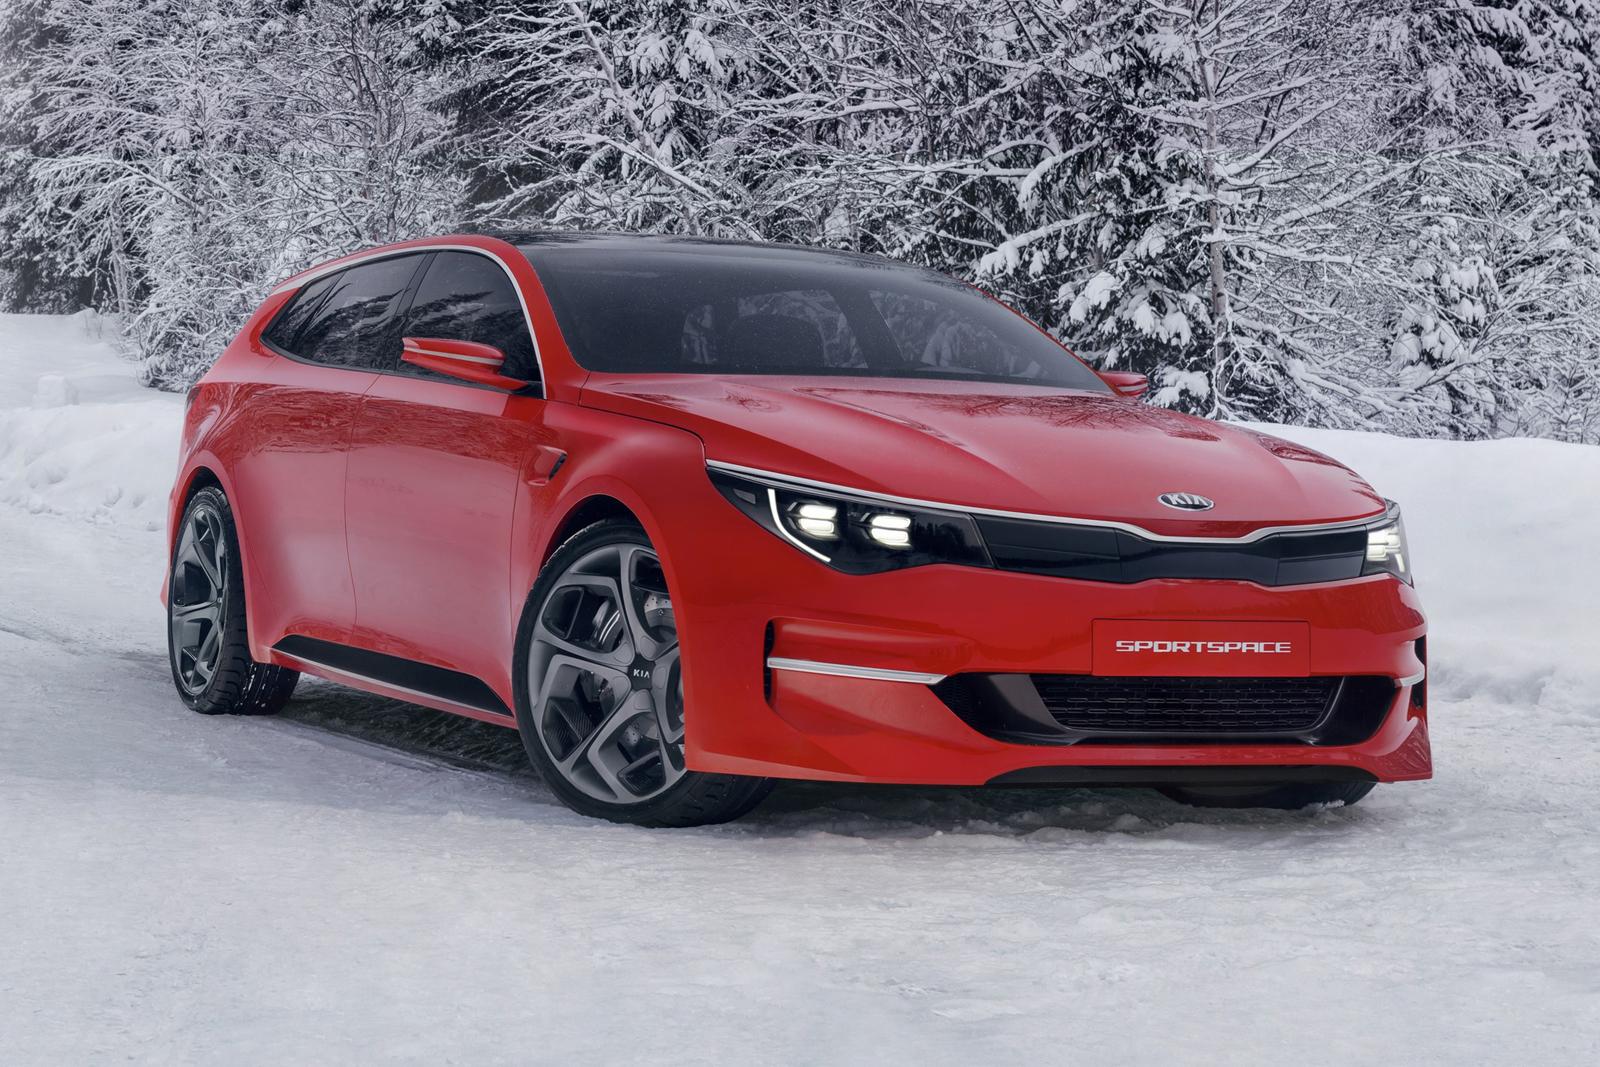 Kia Sportspace Concept Revealed Ahead Of Geneva 2015 Debut